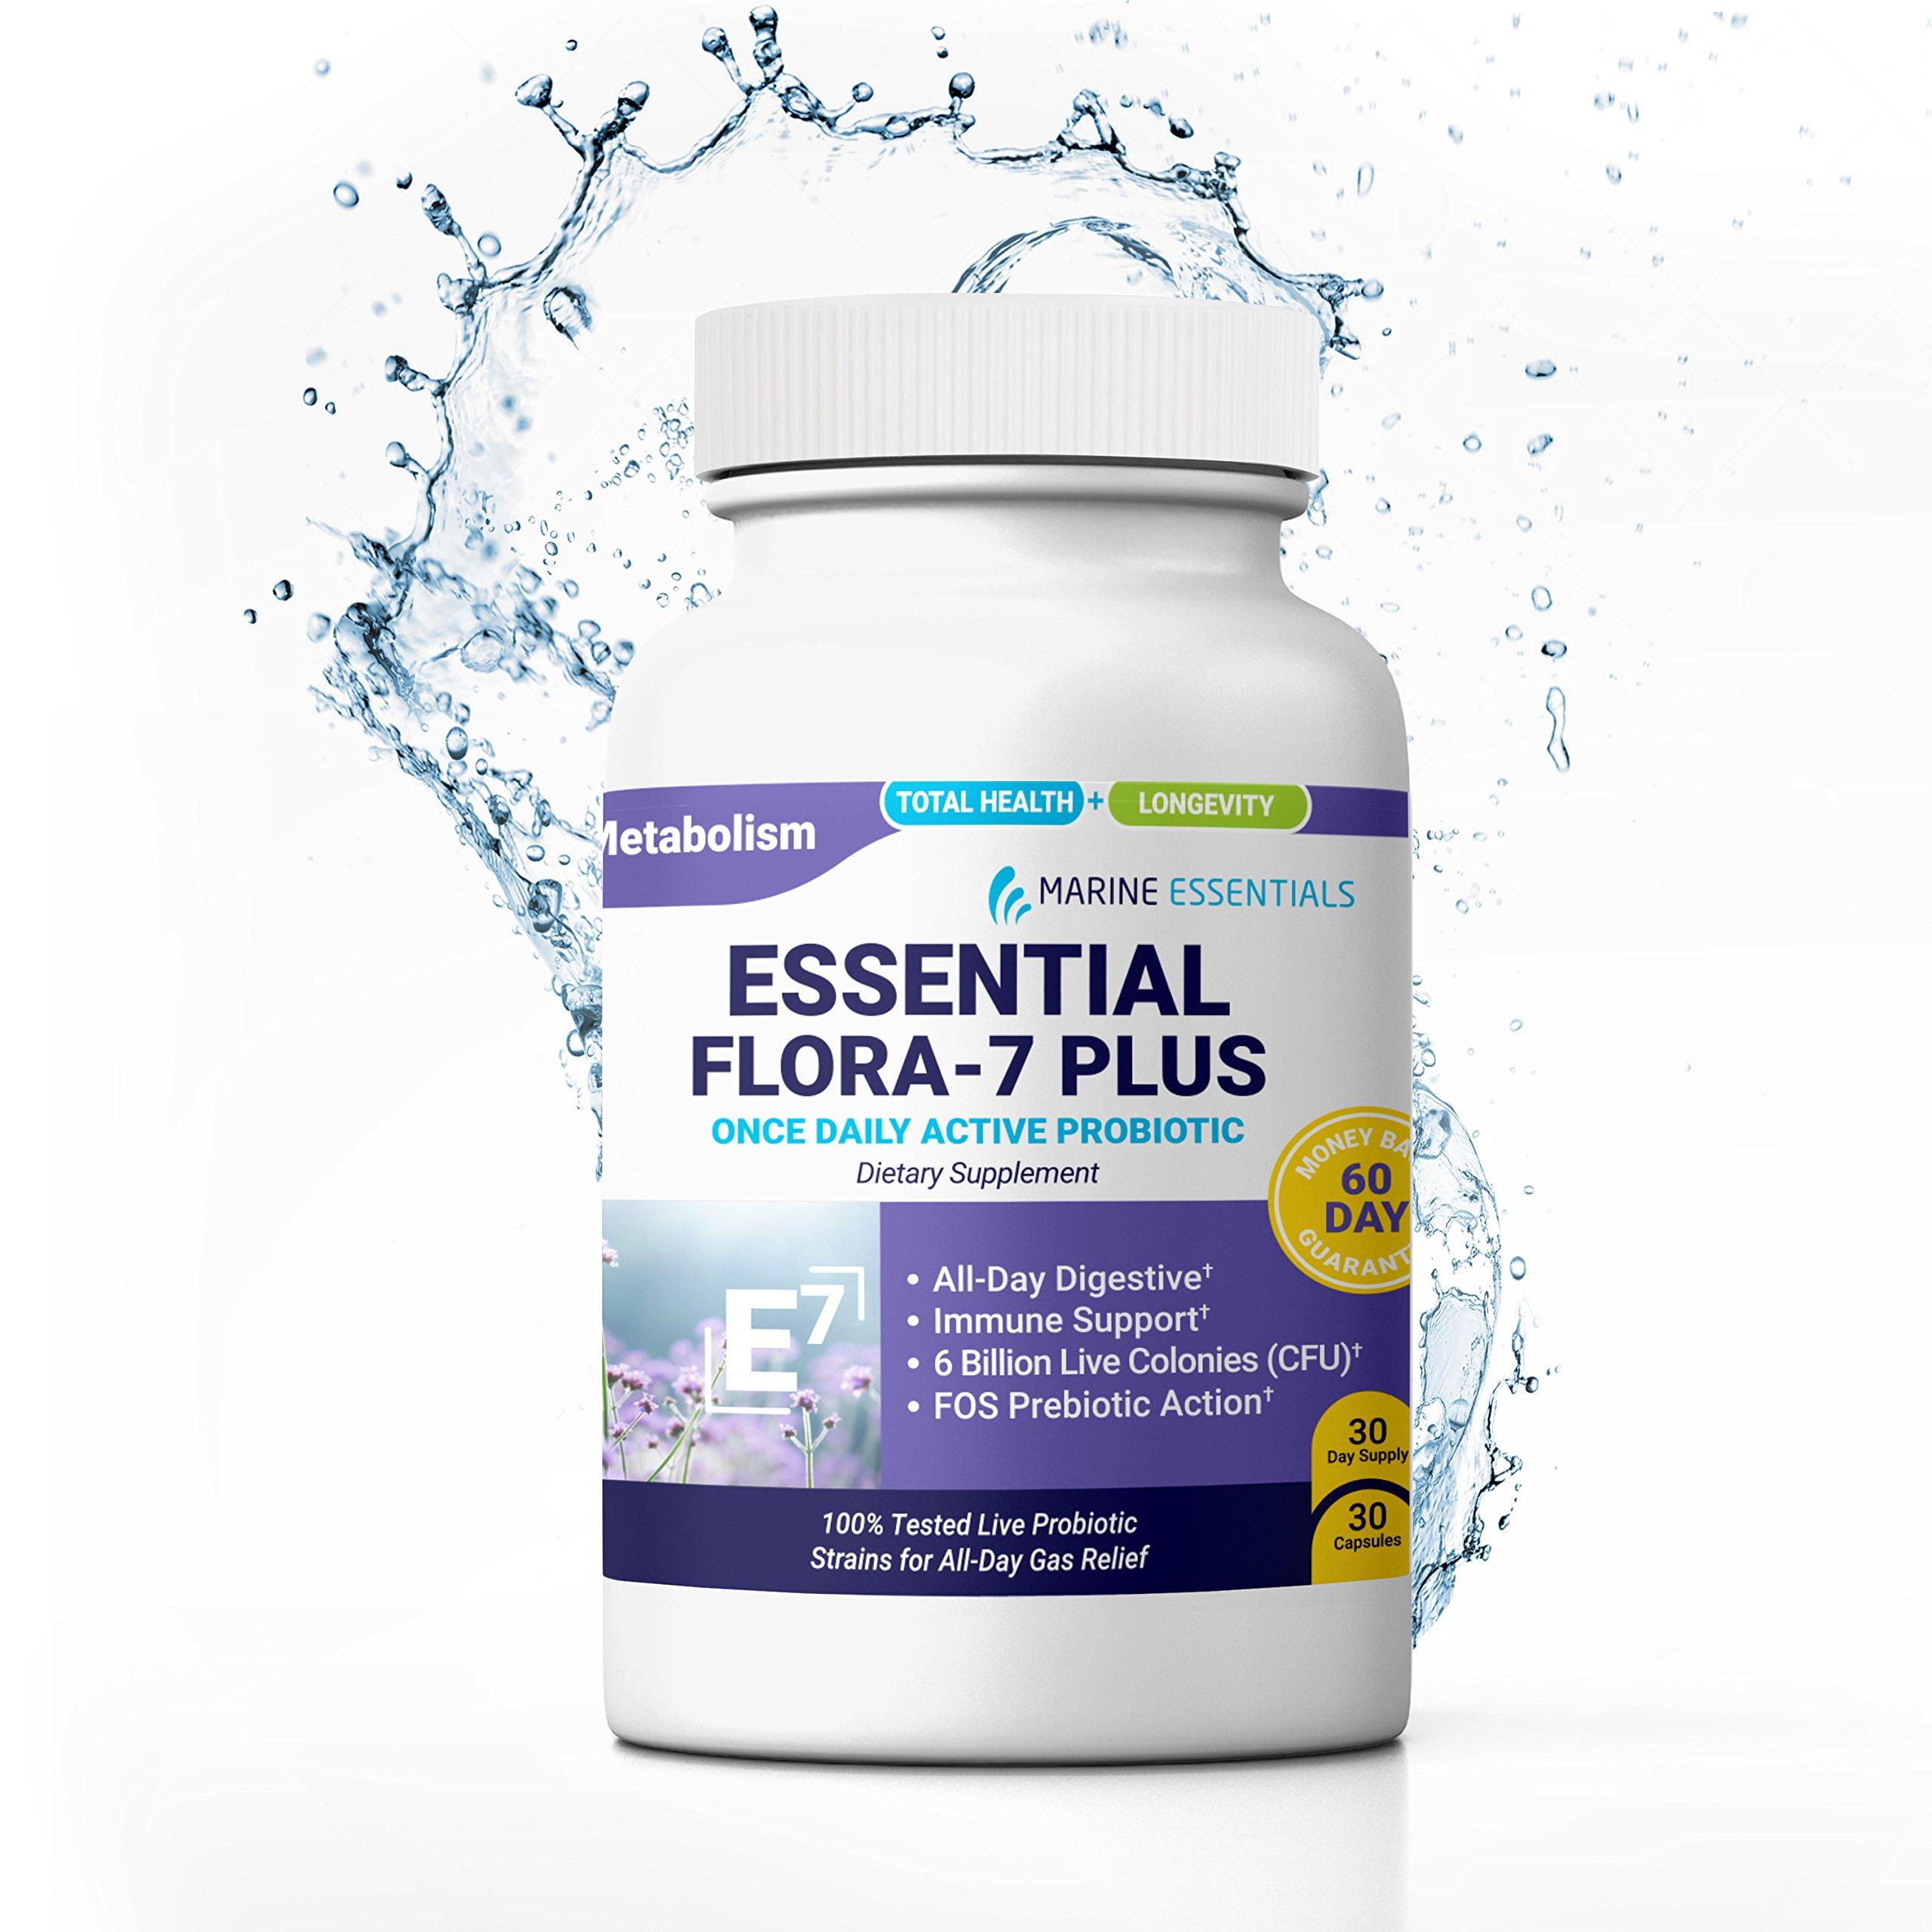 Amazon.com: Marine Essentials Omega 3 Joint Relief